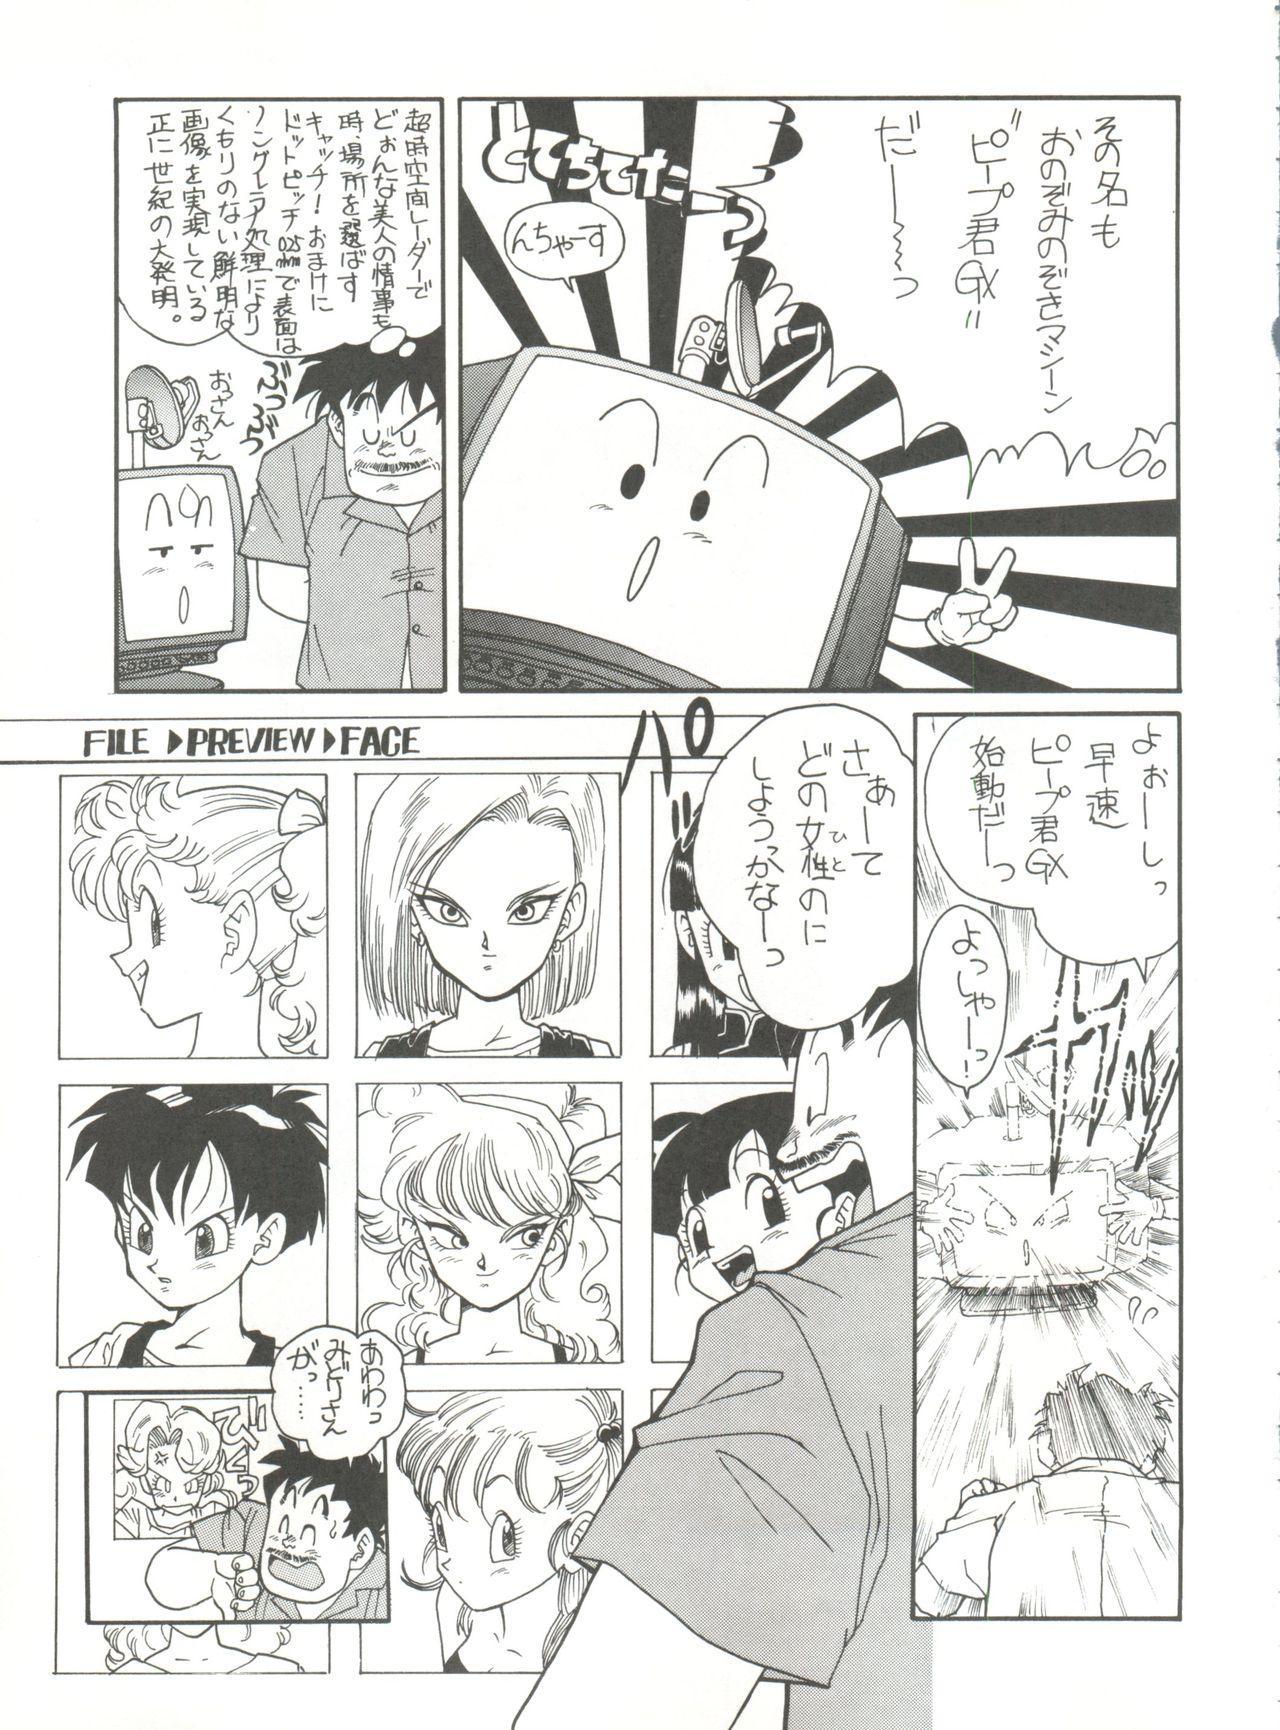 Hara Hara Dokei Vol. 4 Quattro 5